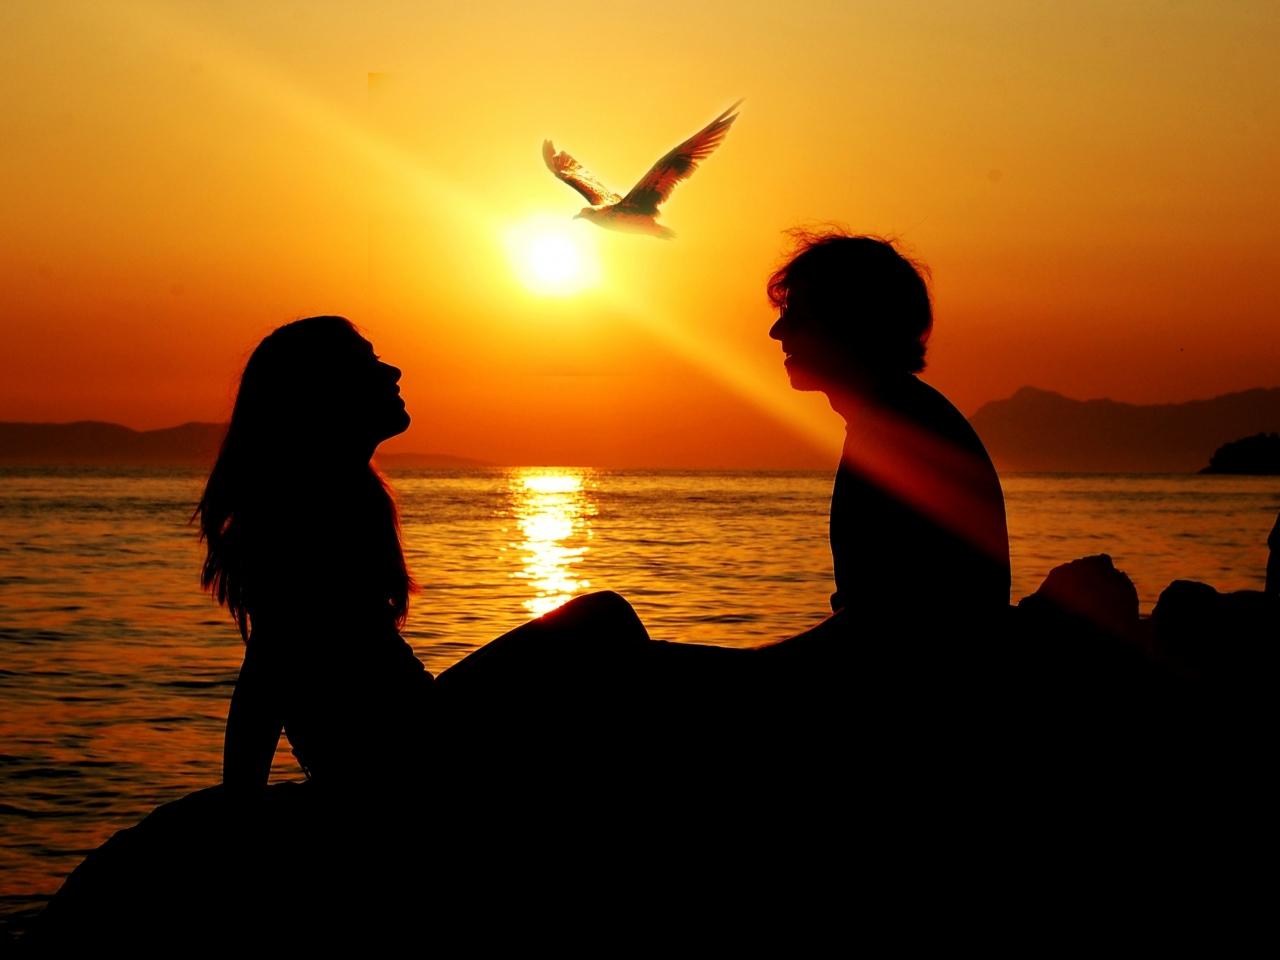 girl-sunset-summer-ray-love-sea-man-bird-freedom-silhouette-sun-sea-gull.jpg